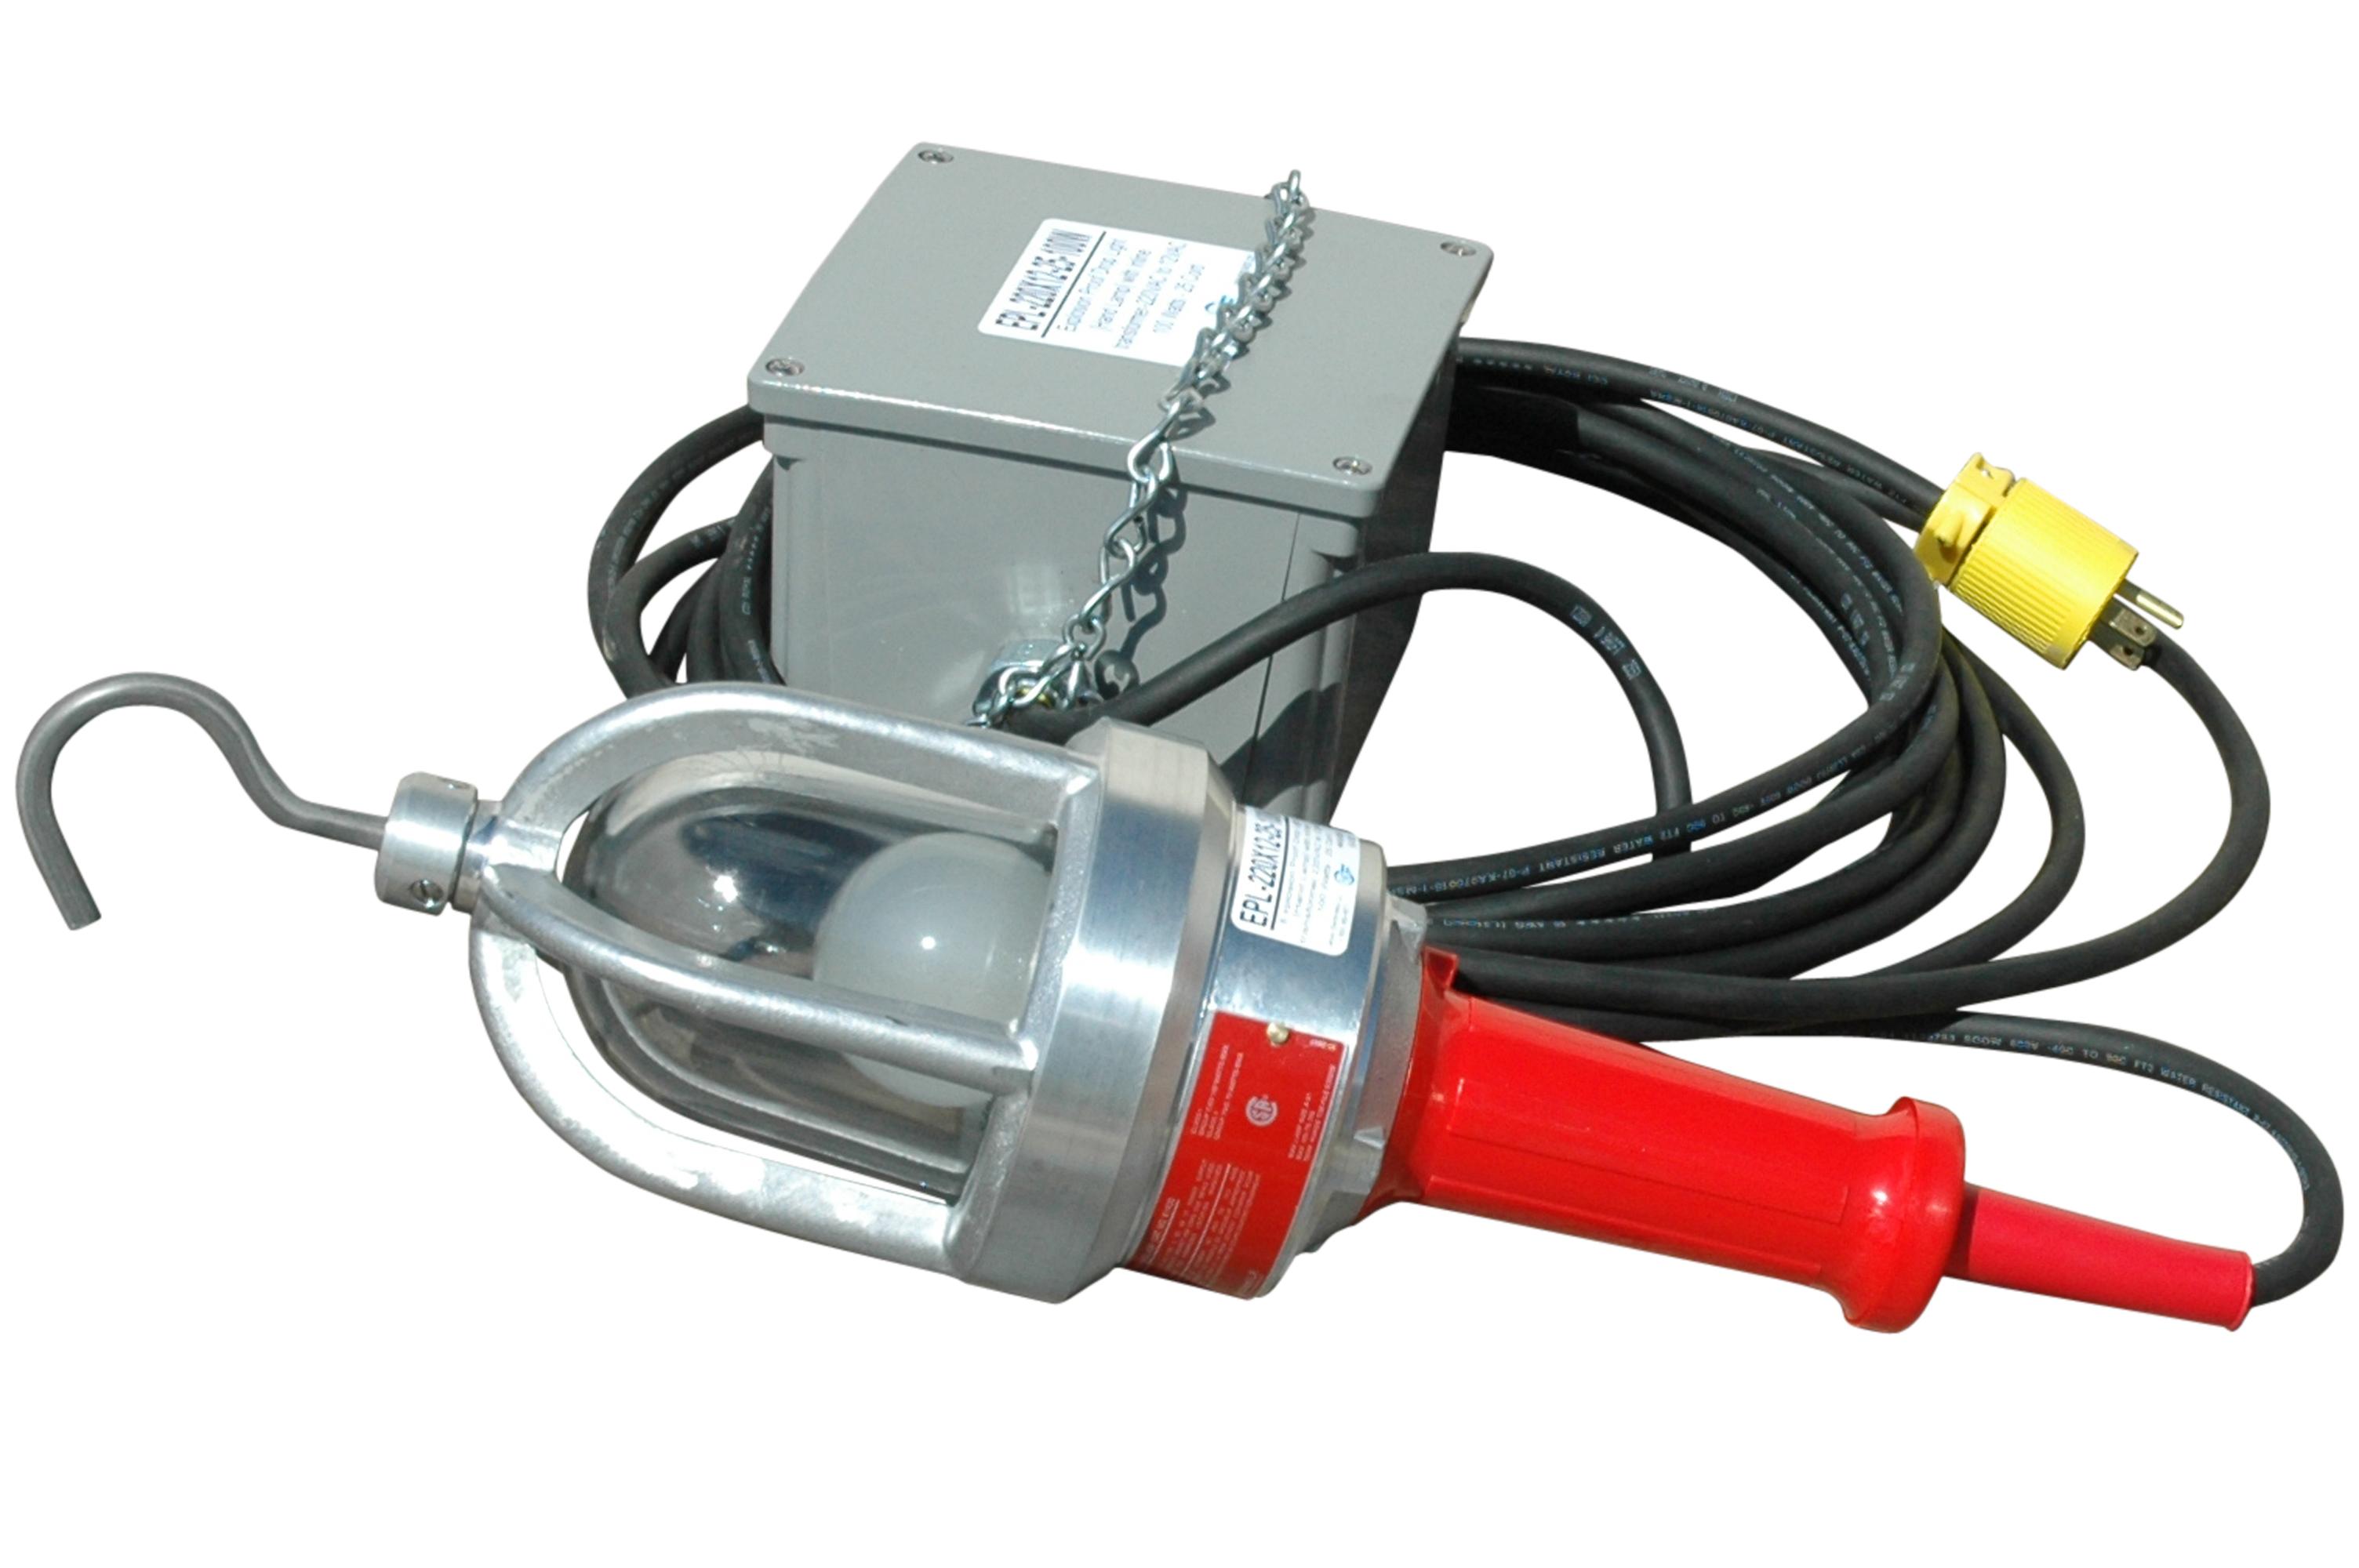 Larson Electronics Releases 230 Vac Compatible Low Voltage